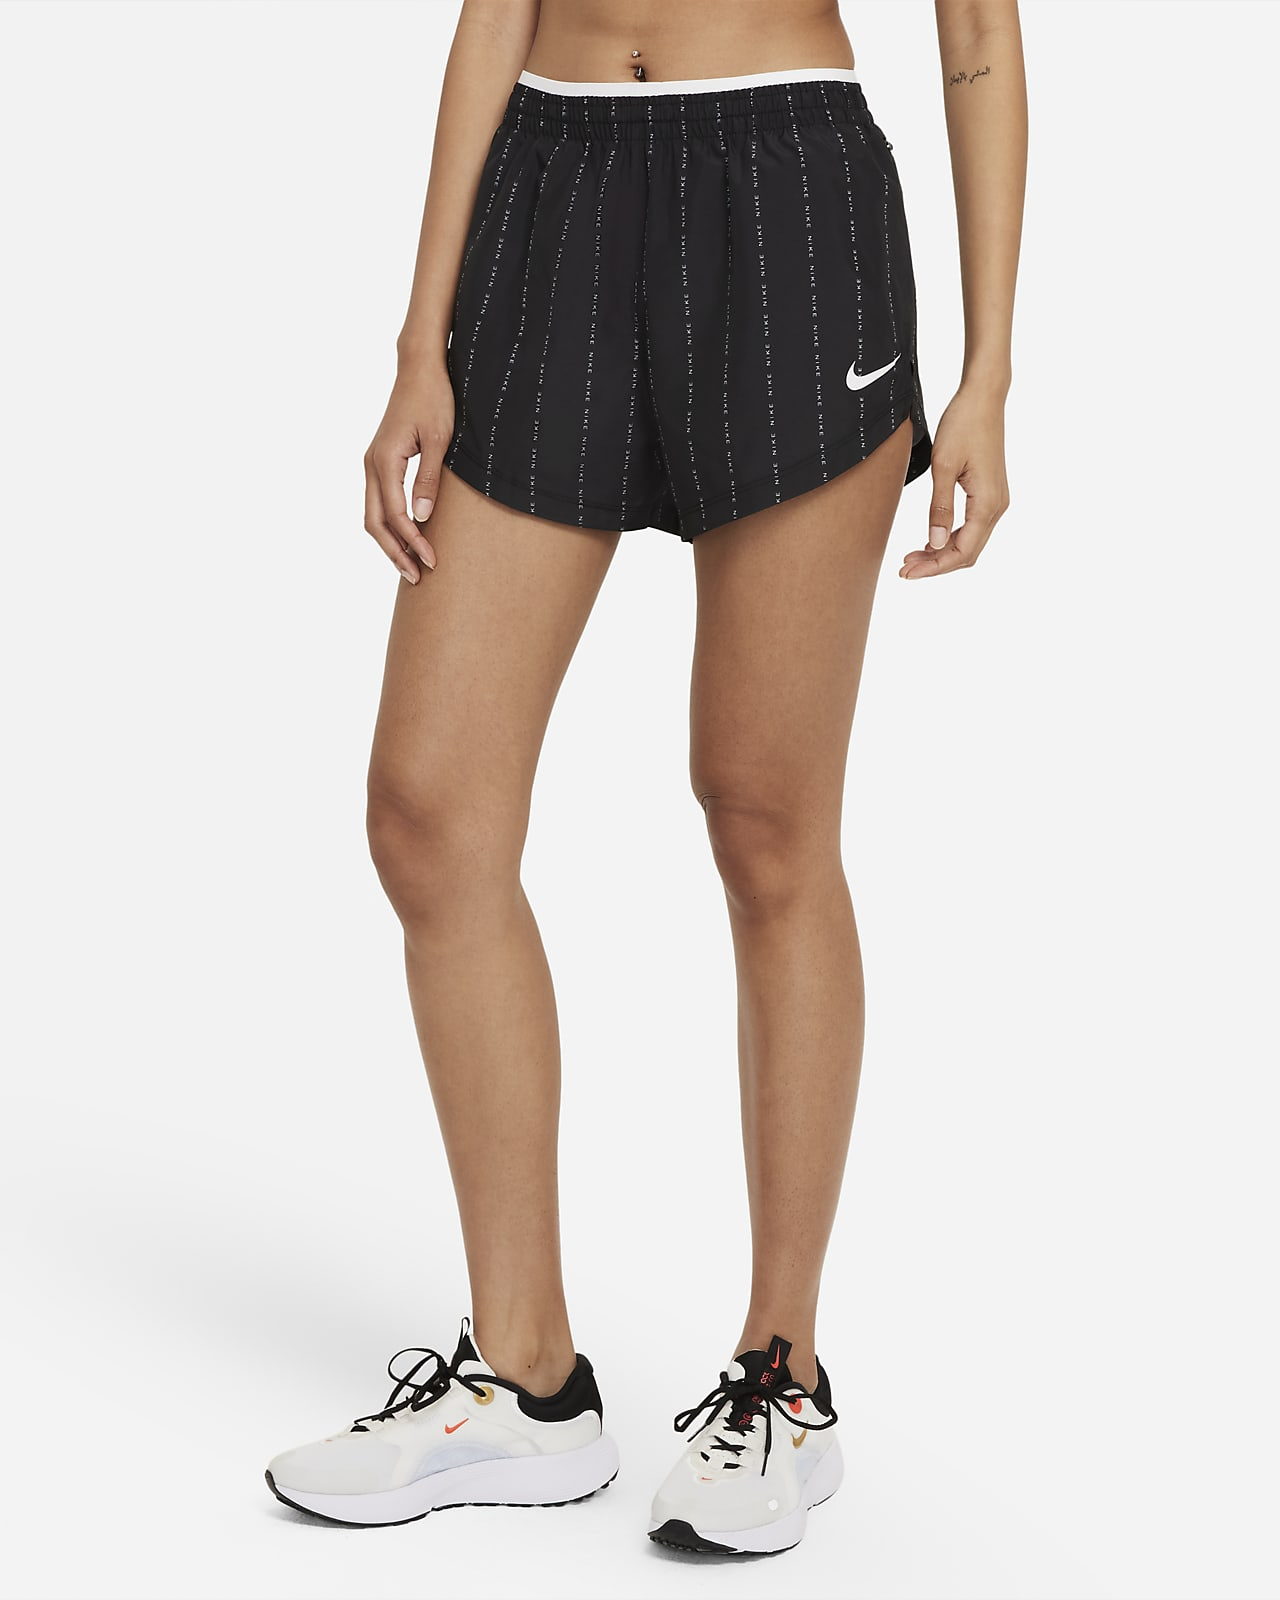 Женские беговые шорты Nike Dri-FIT Tempo Luxe Icon Clash